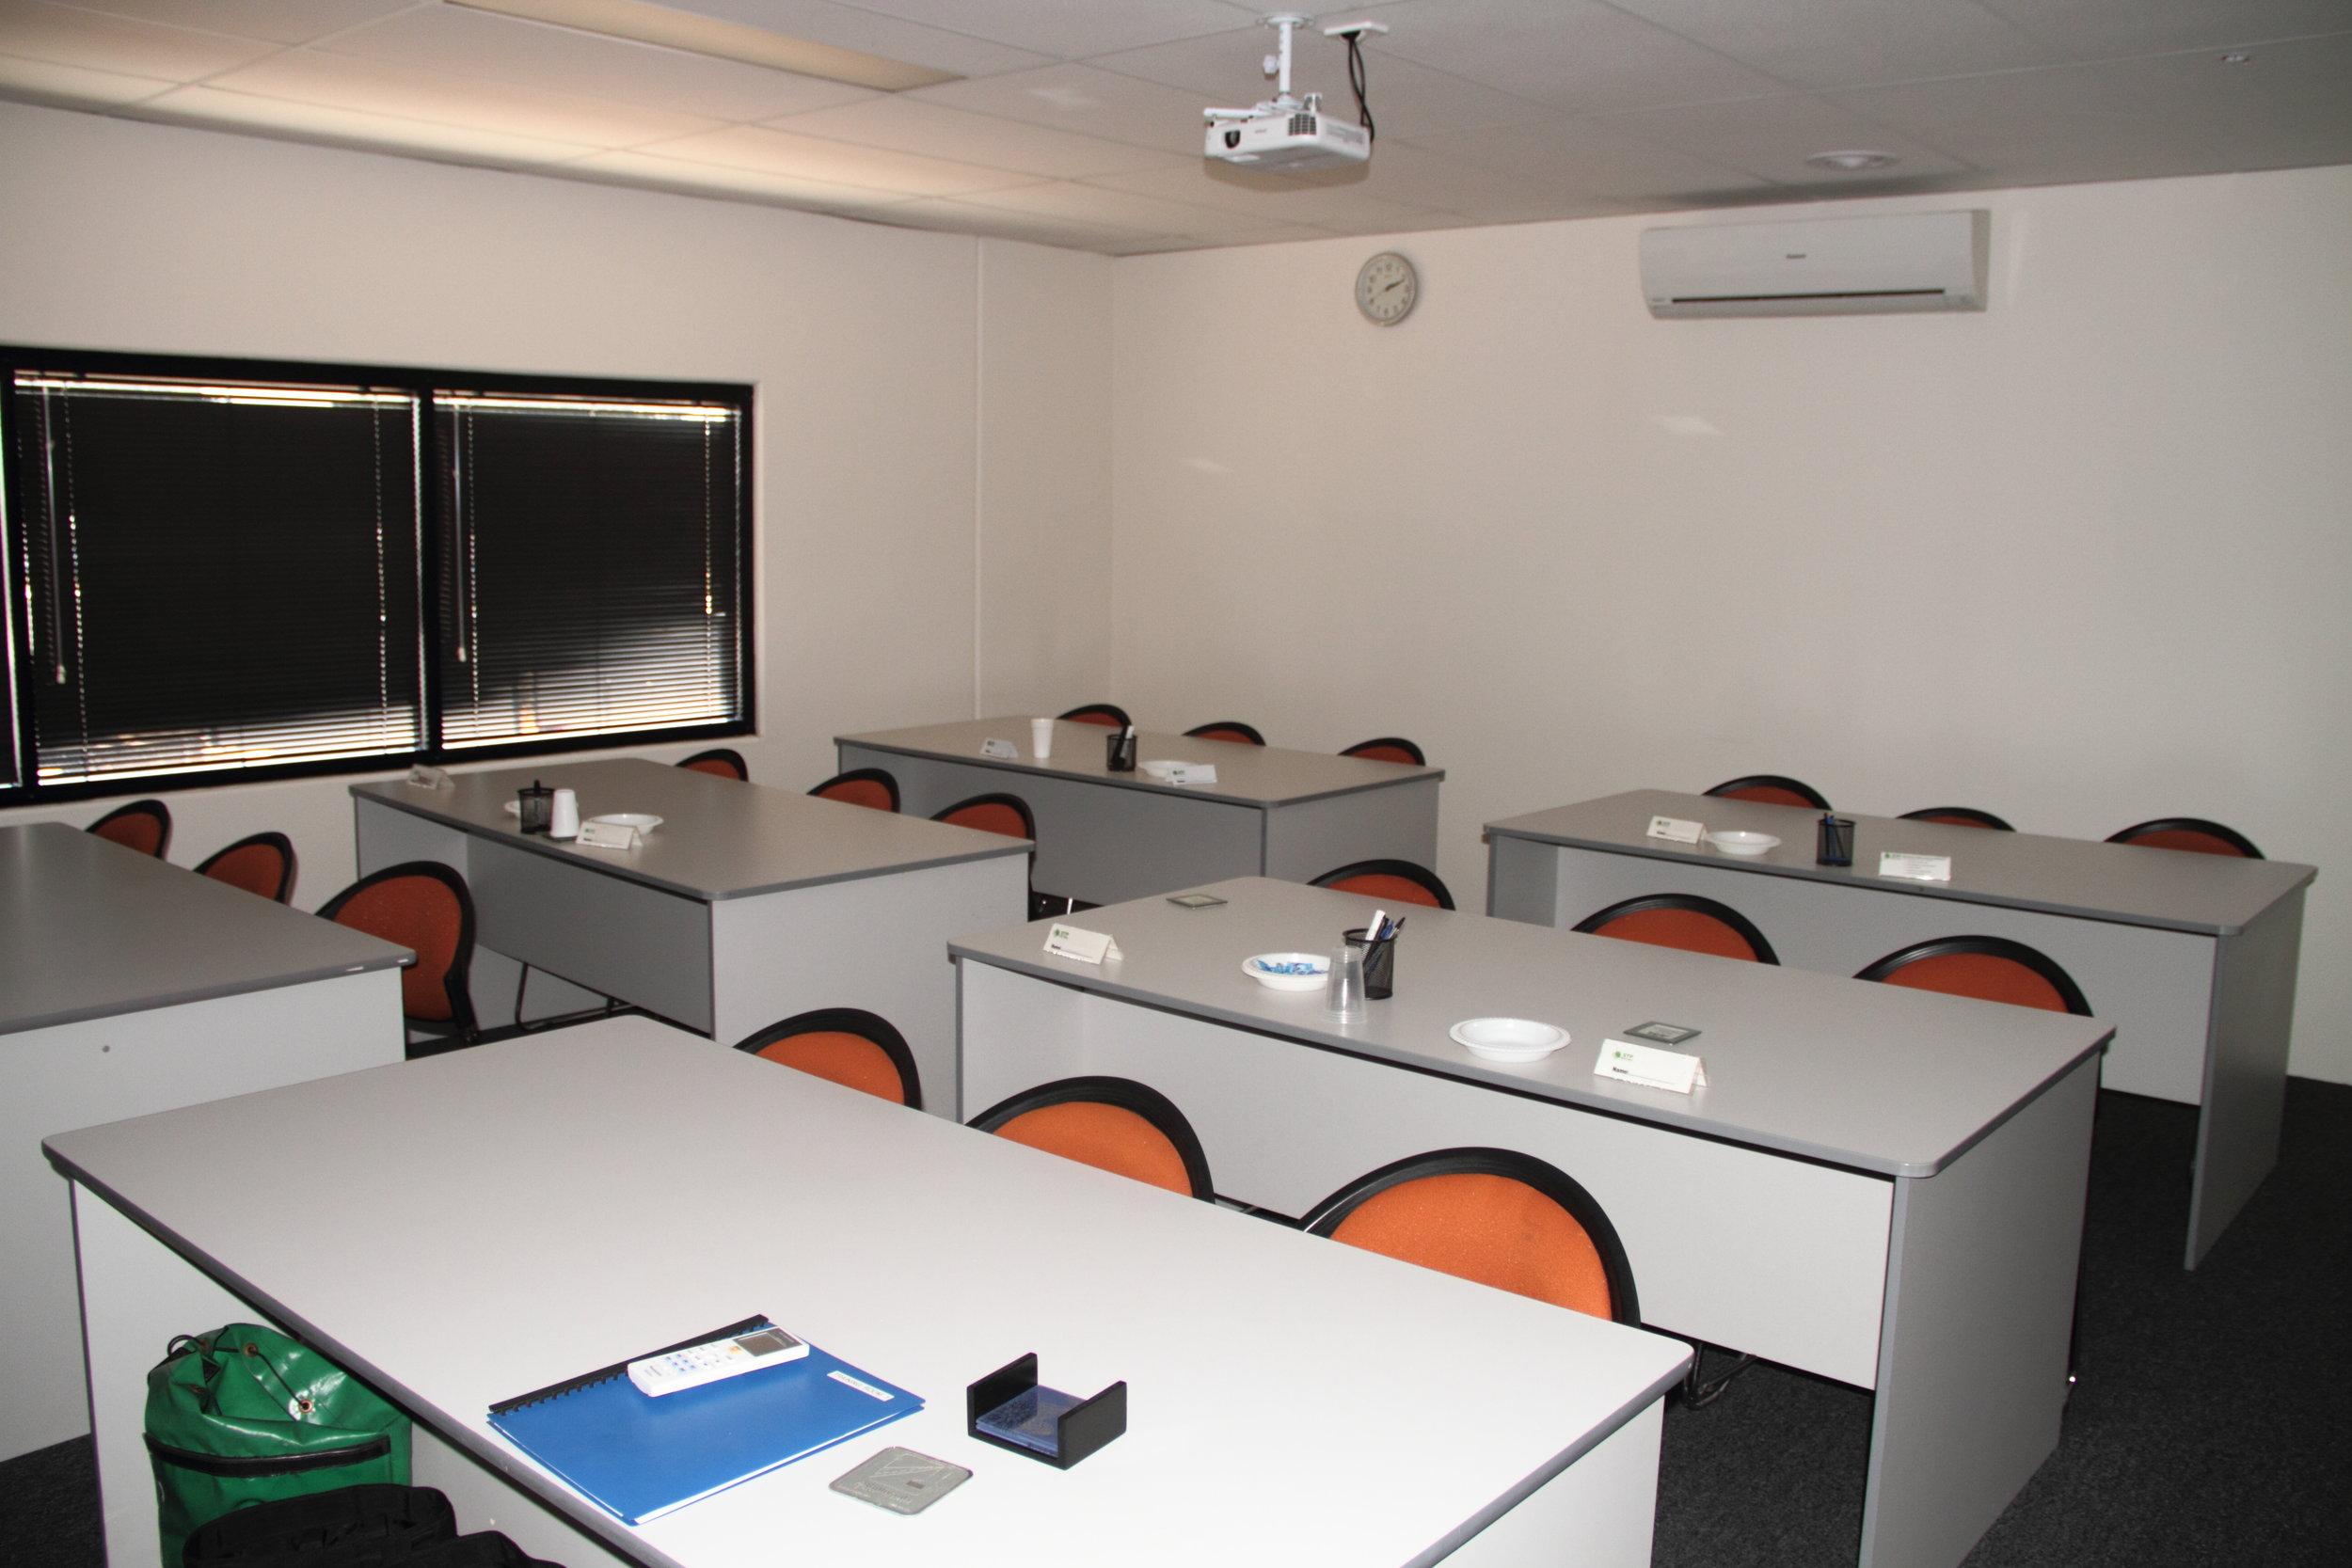 18 seat full size desk Classroom STP.JPG